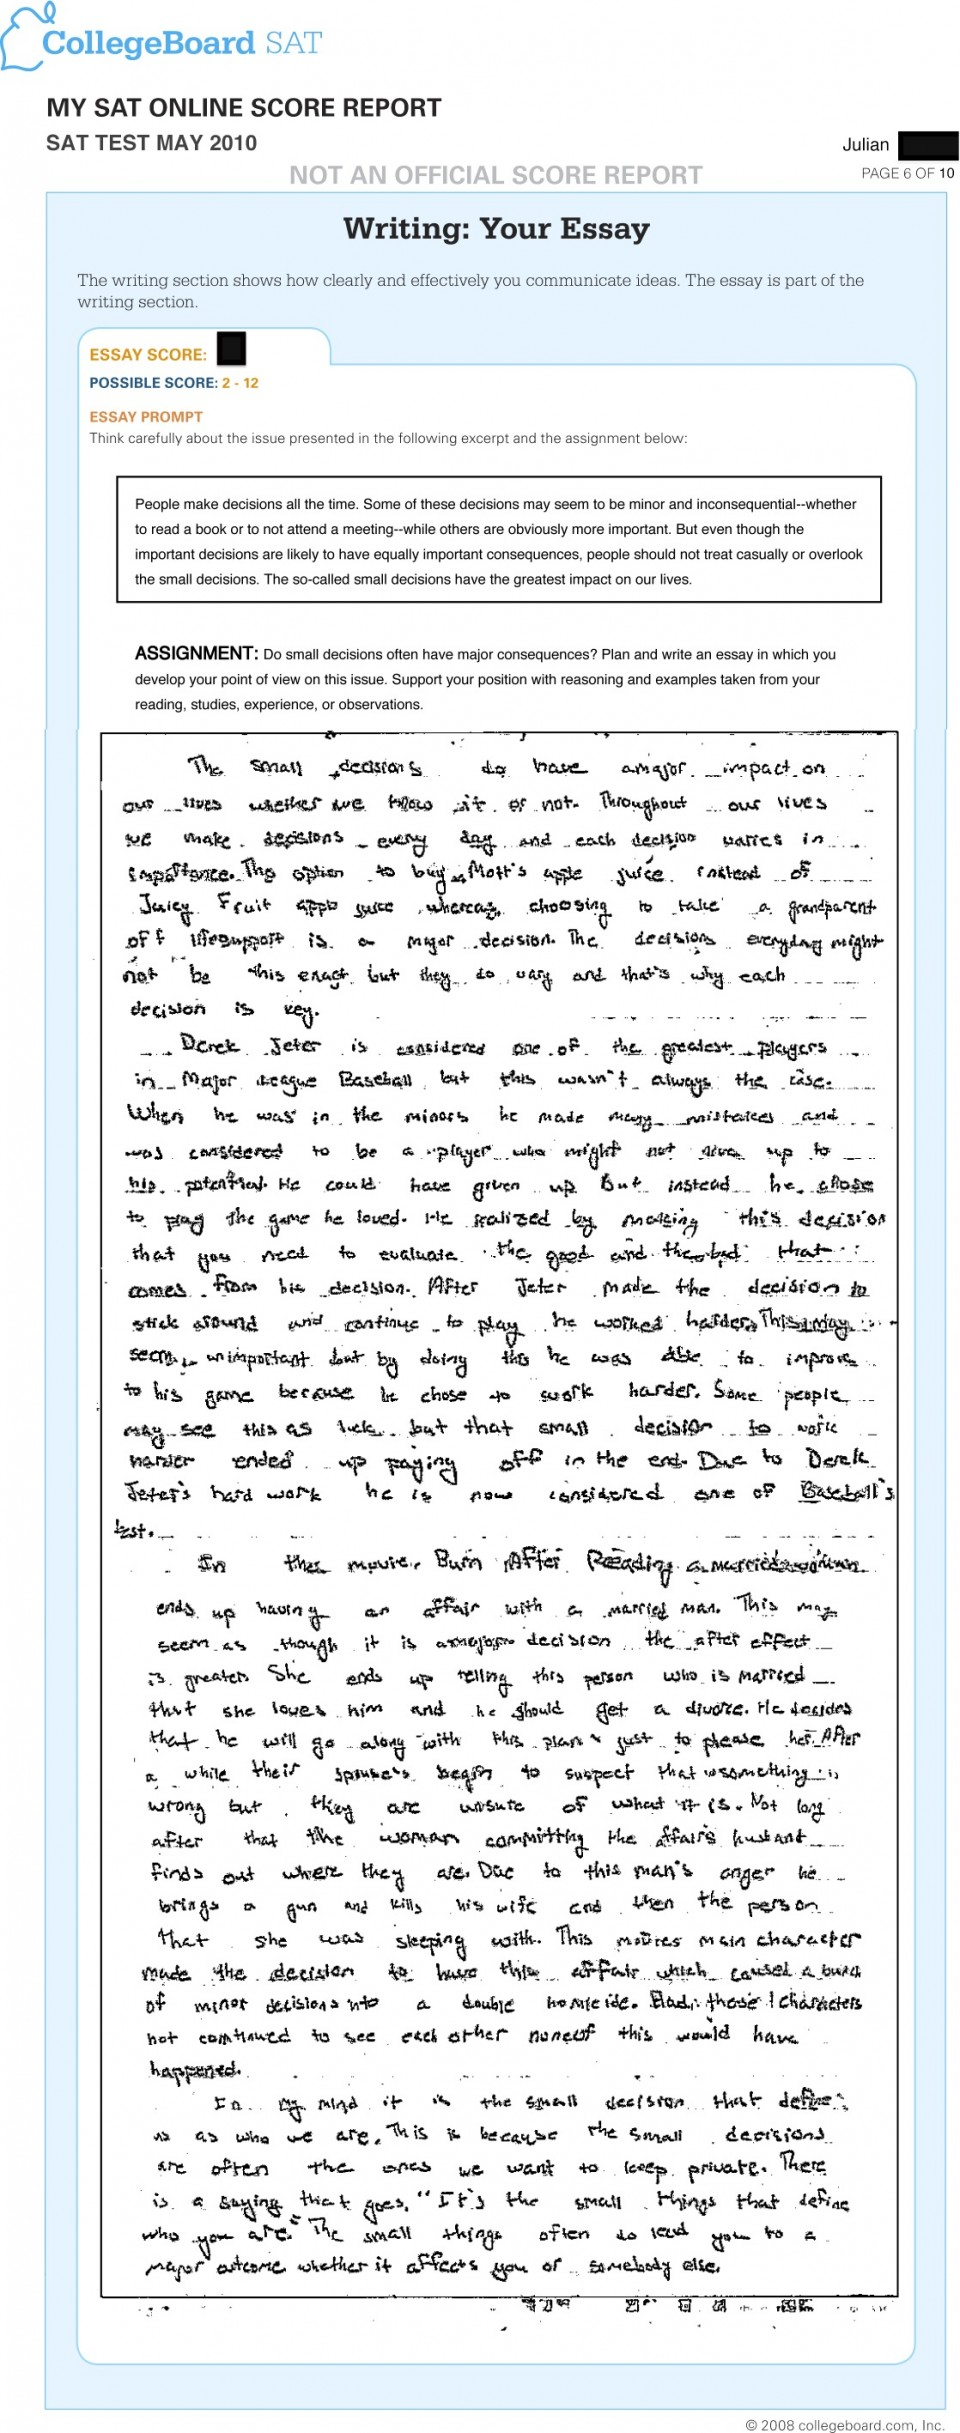 011 Essay Example Sat Prompts Jr May Surprising 2015 2017 Prompt June 960